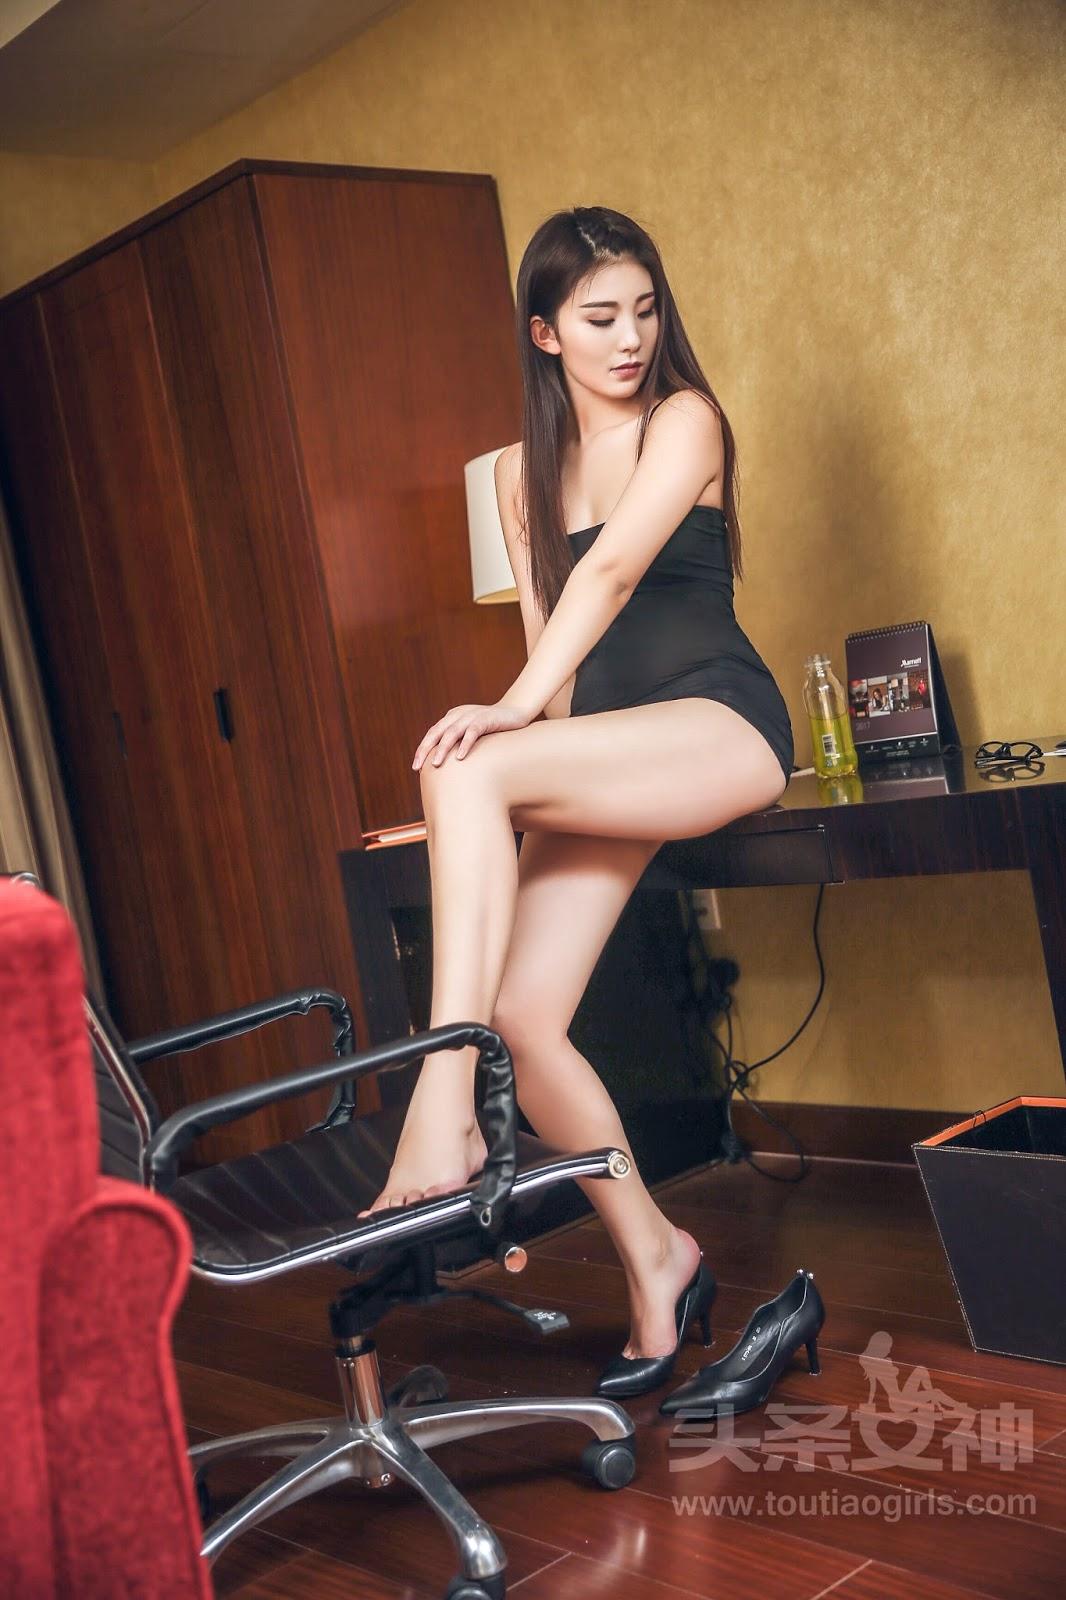 TouTiao 2017-07-18 Li Xue (30 pics) 李雪 TouTiao pictures Li Xue gravure chinesse girl china